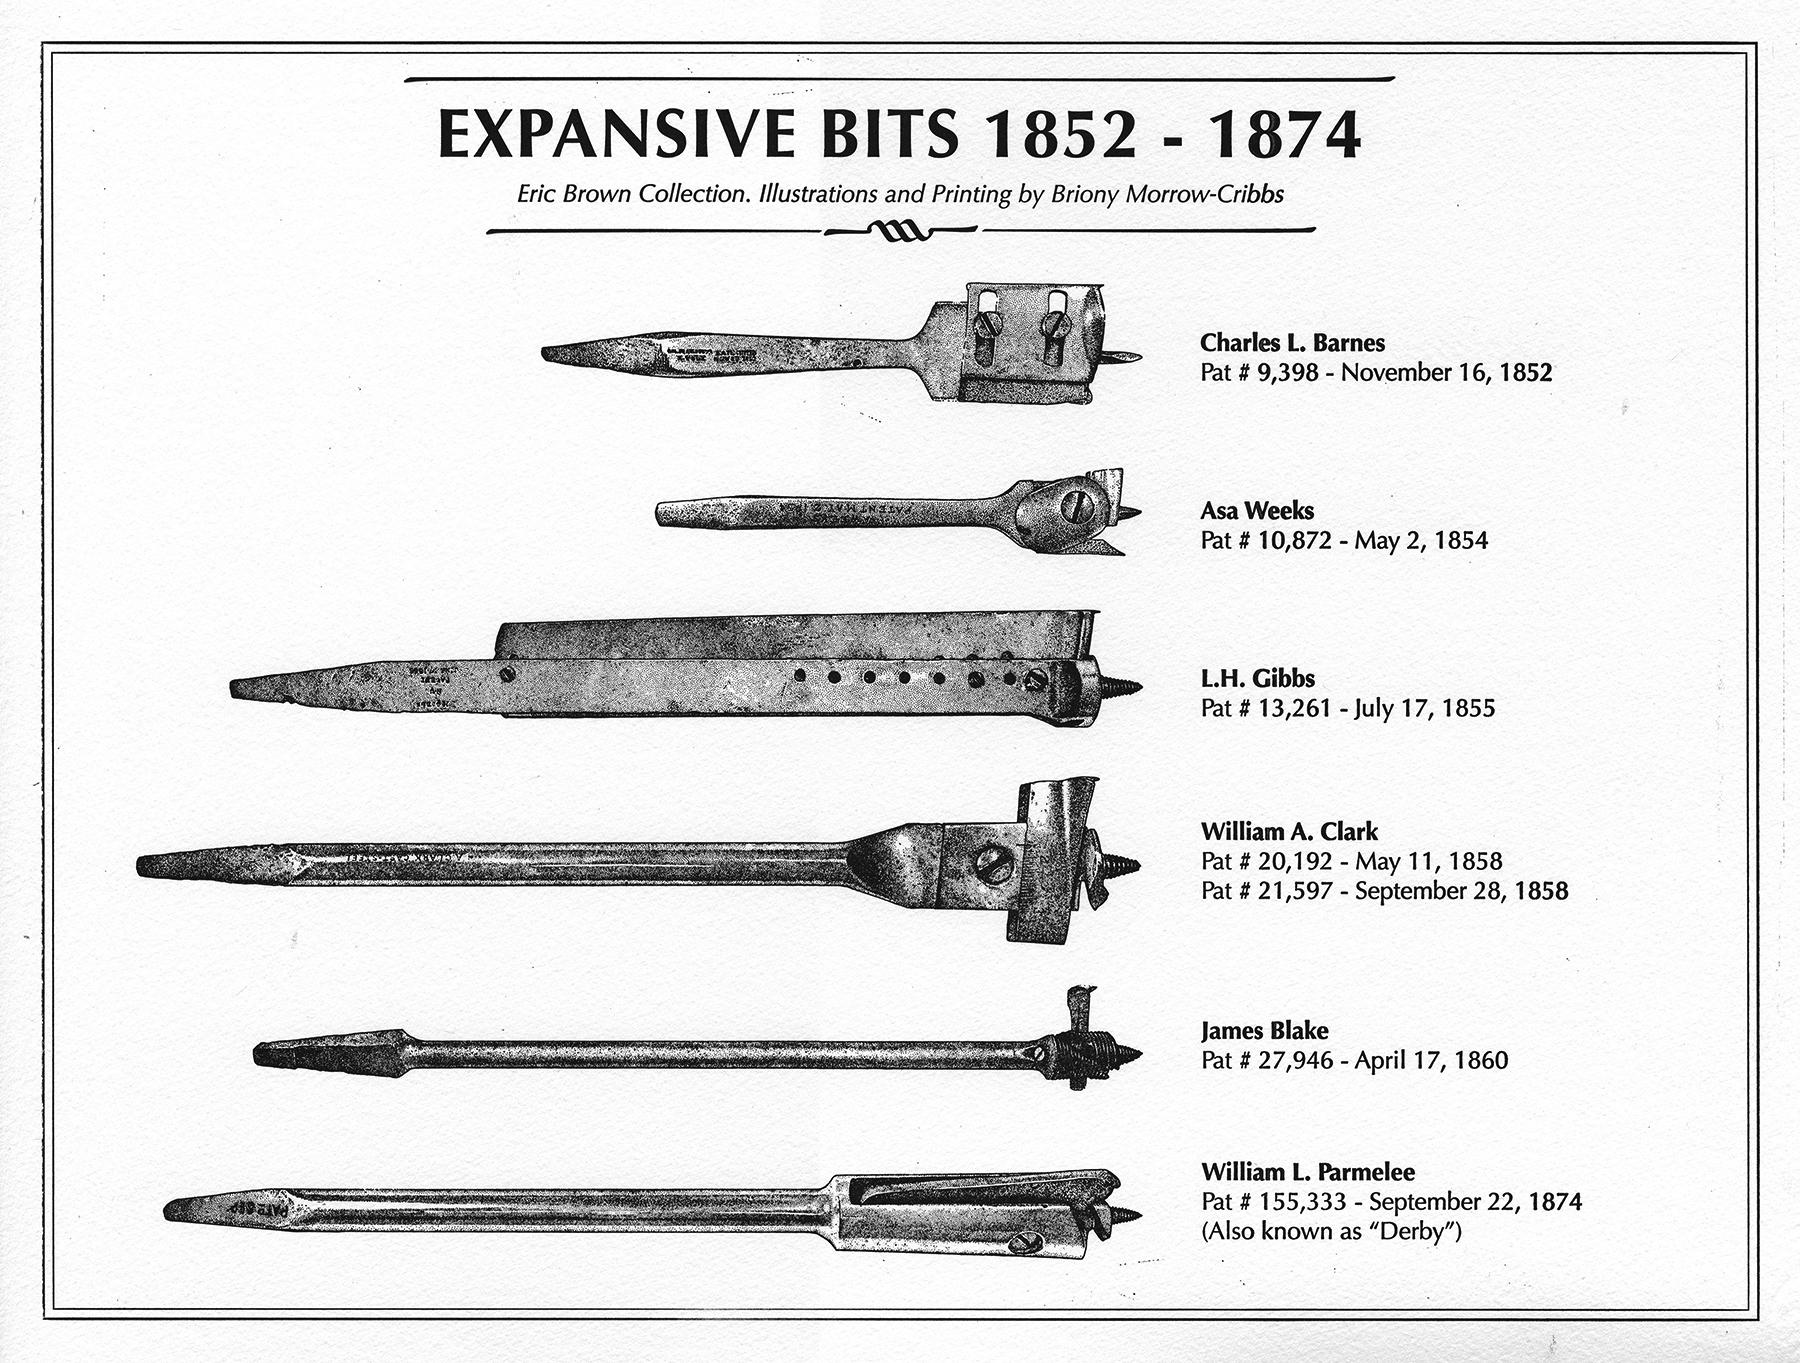 Expansive Bits